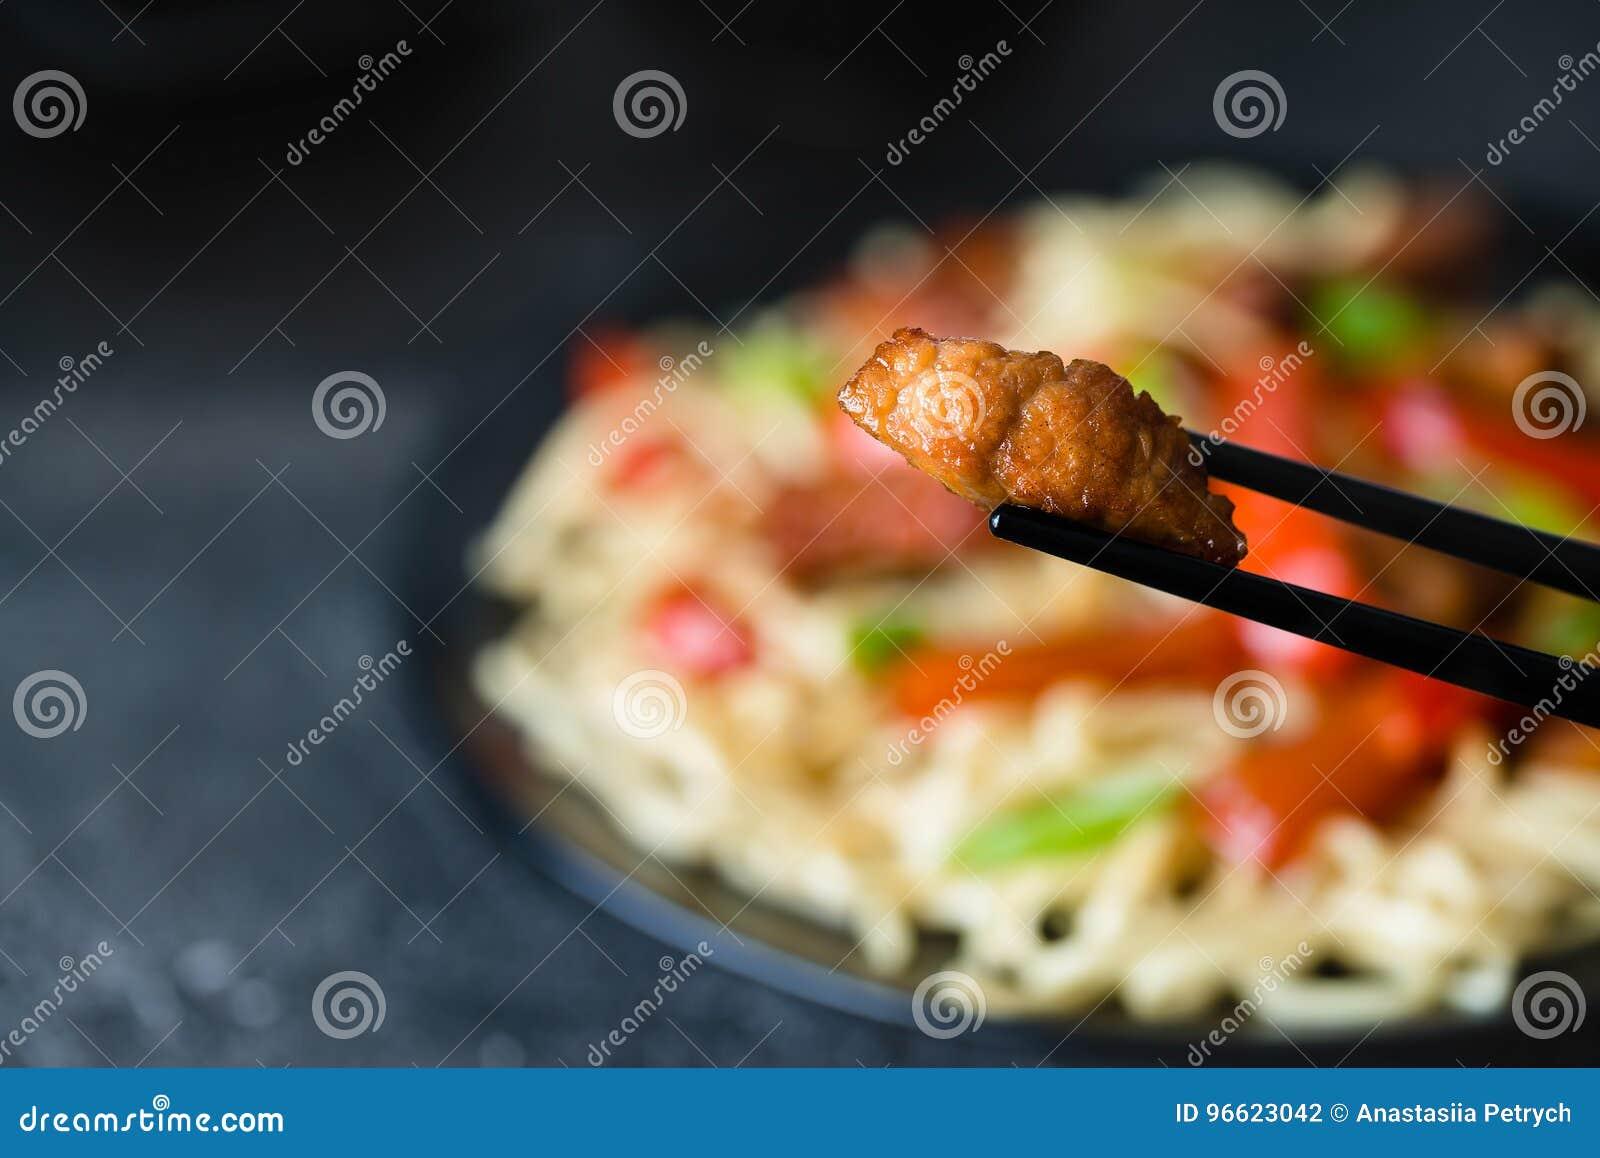 Szechuan Stir Fried Spicy Pork Hold With Chop Sticks